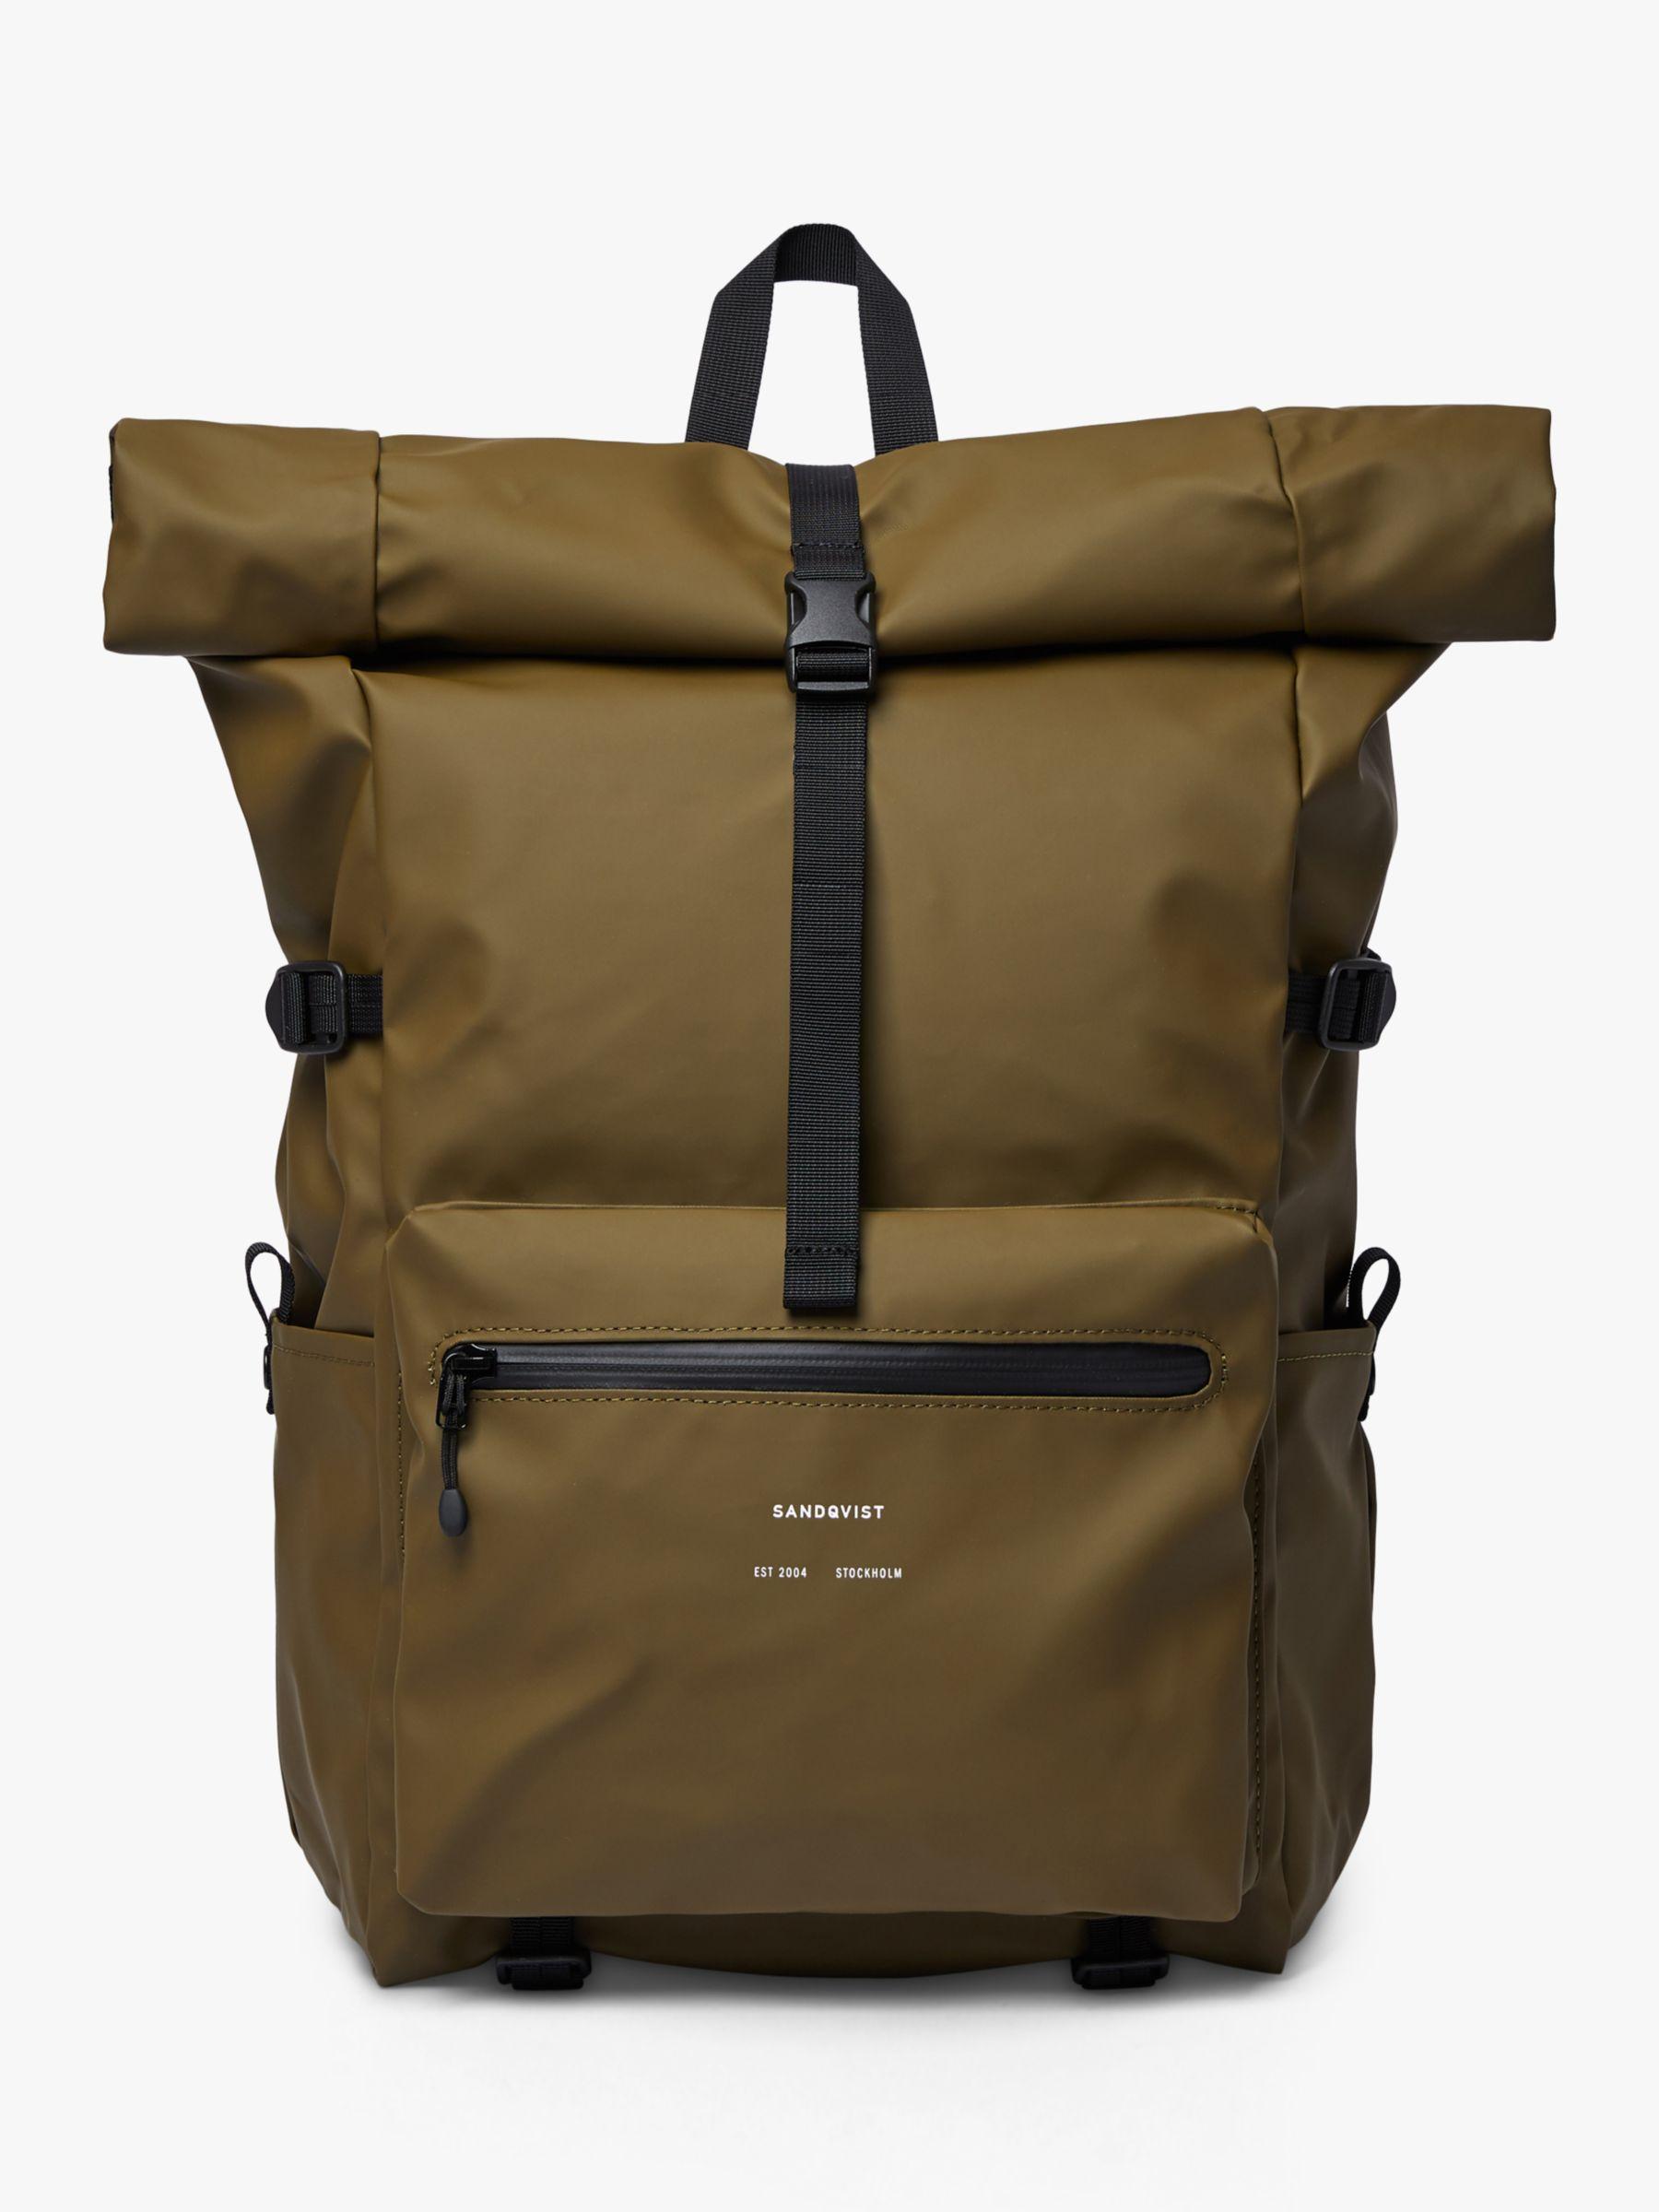 Sandqvist Sandqvist Ruben Recycled Rolltop Backpack, Olive